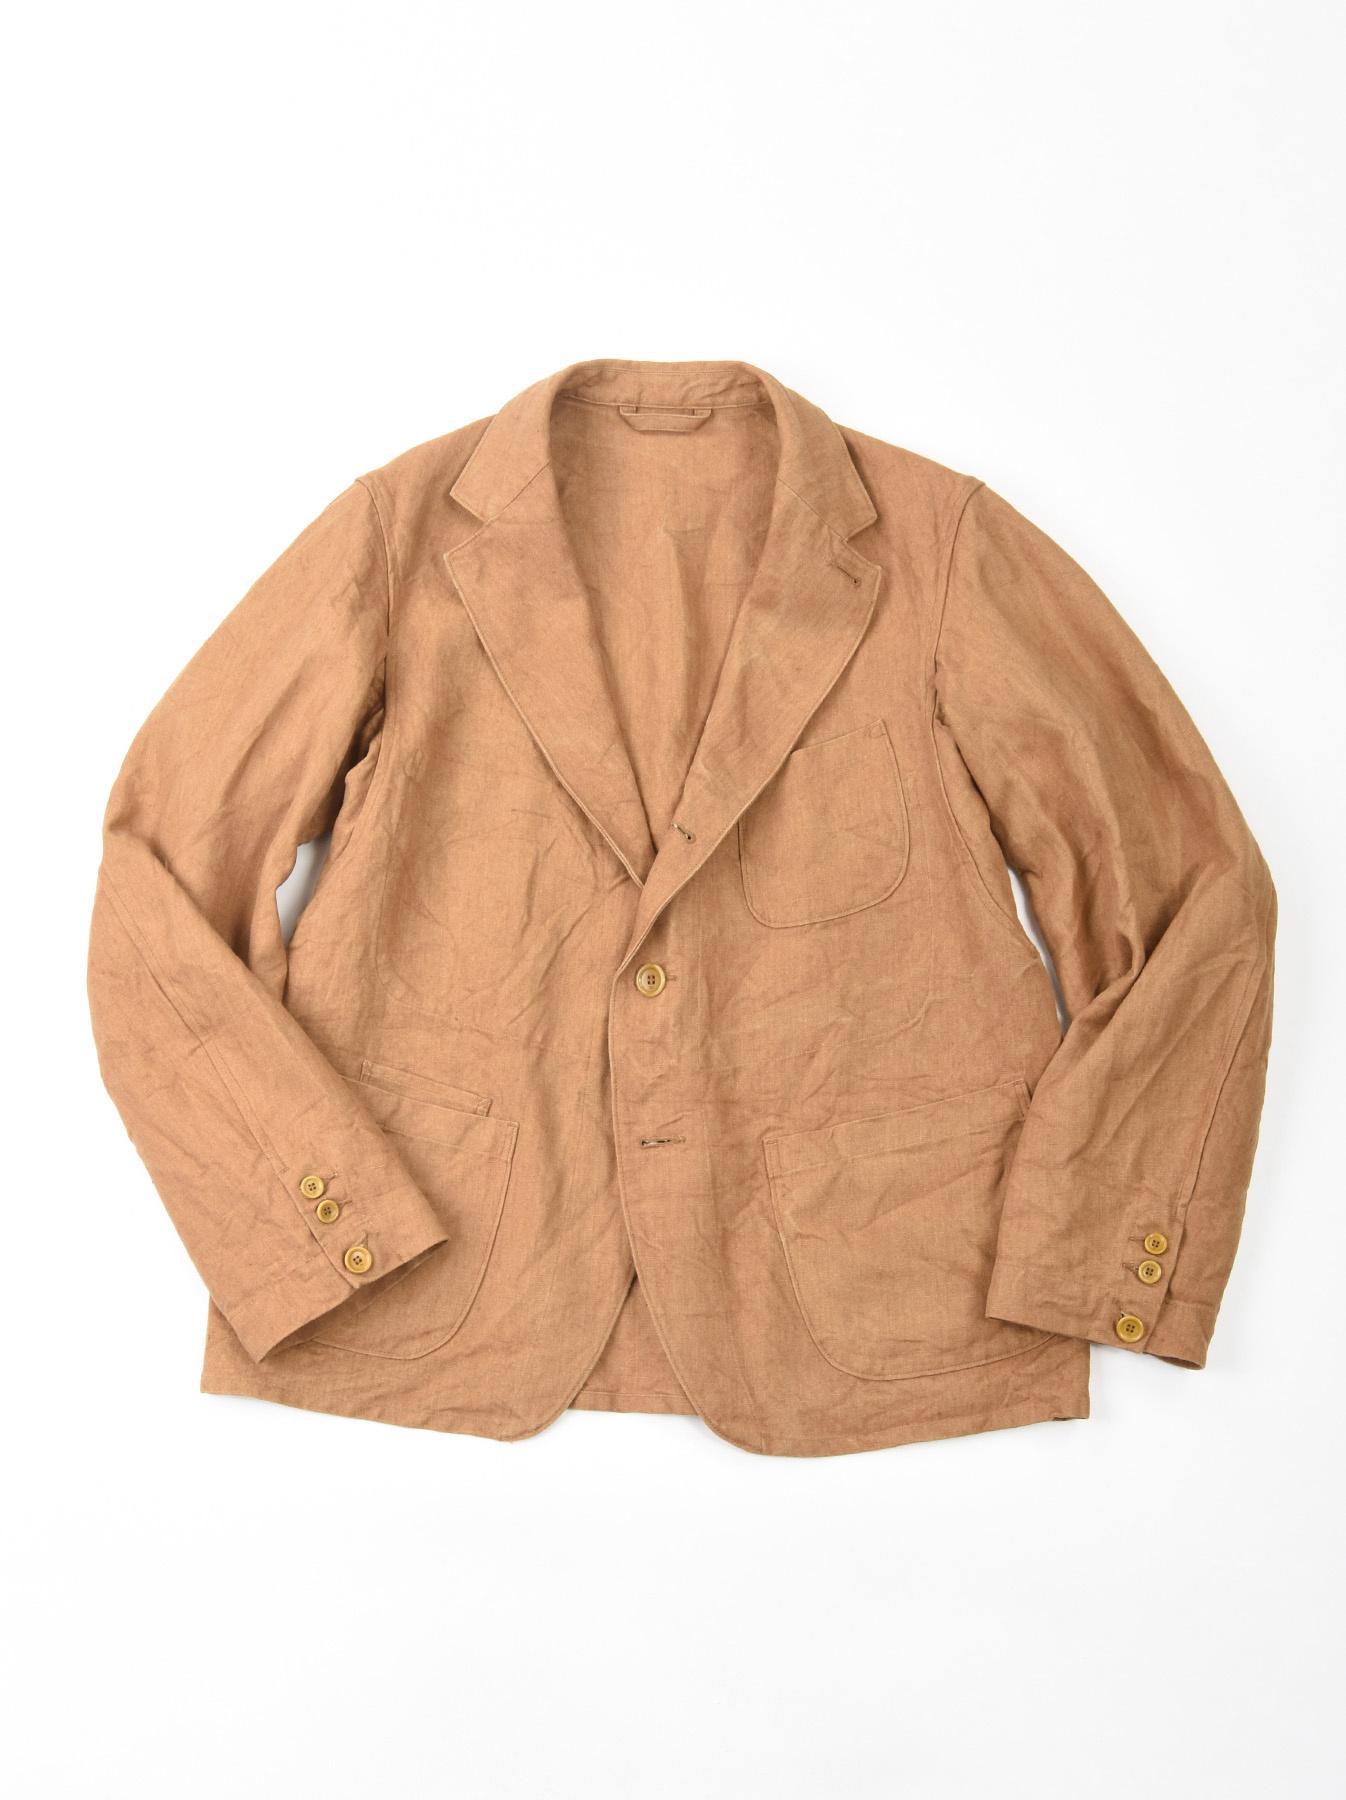 Linen Duck Asama Jacket-1